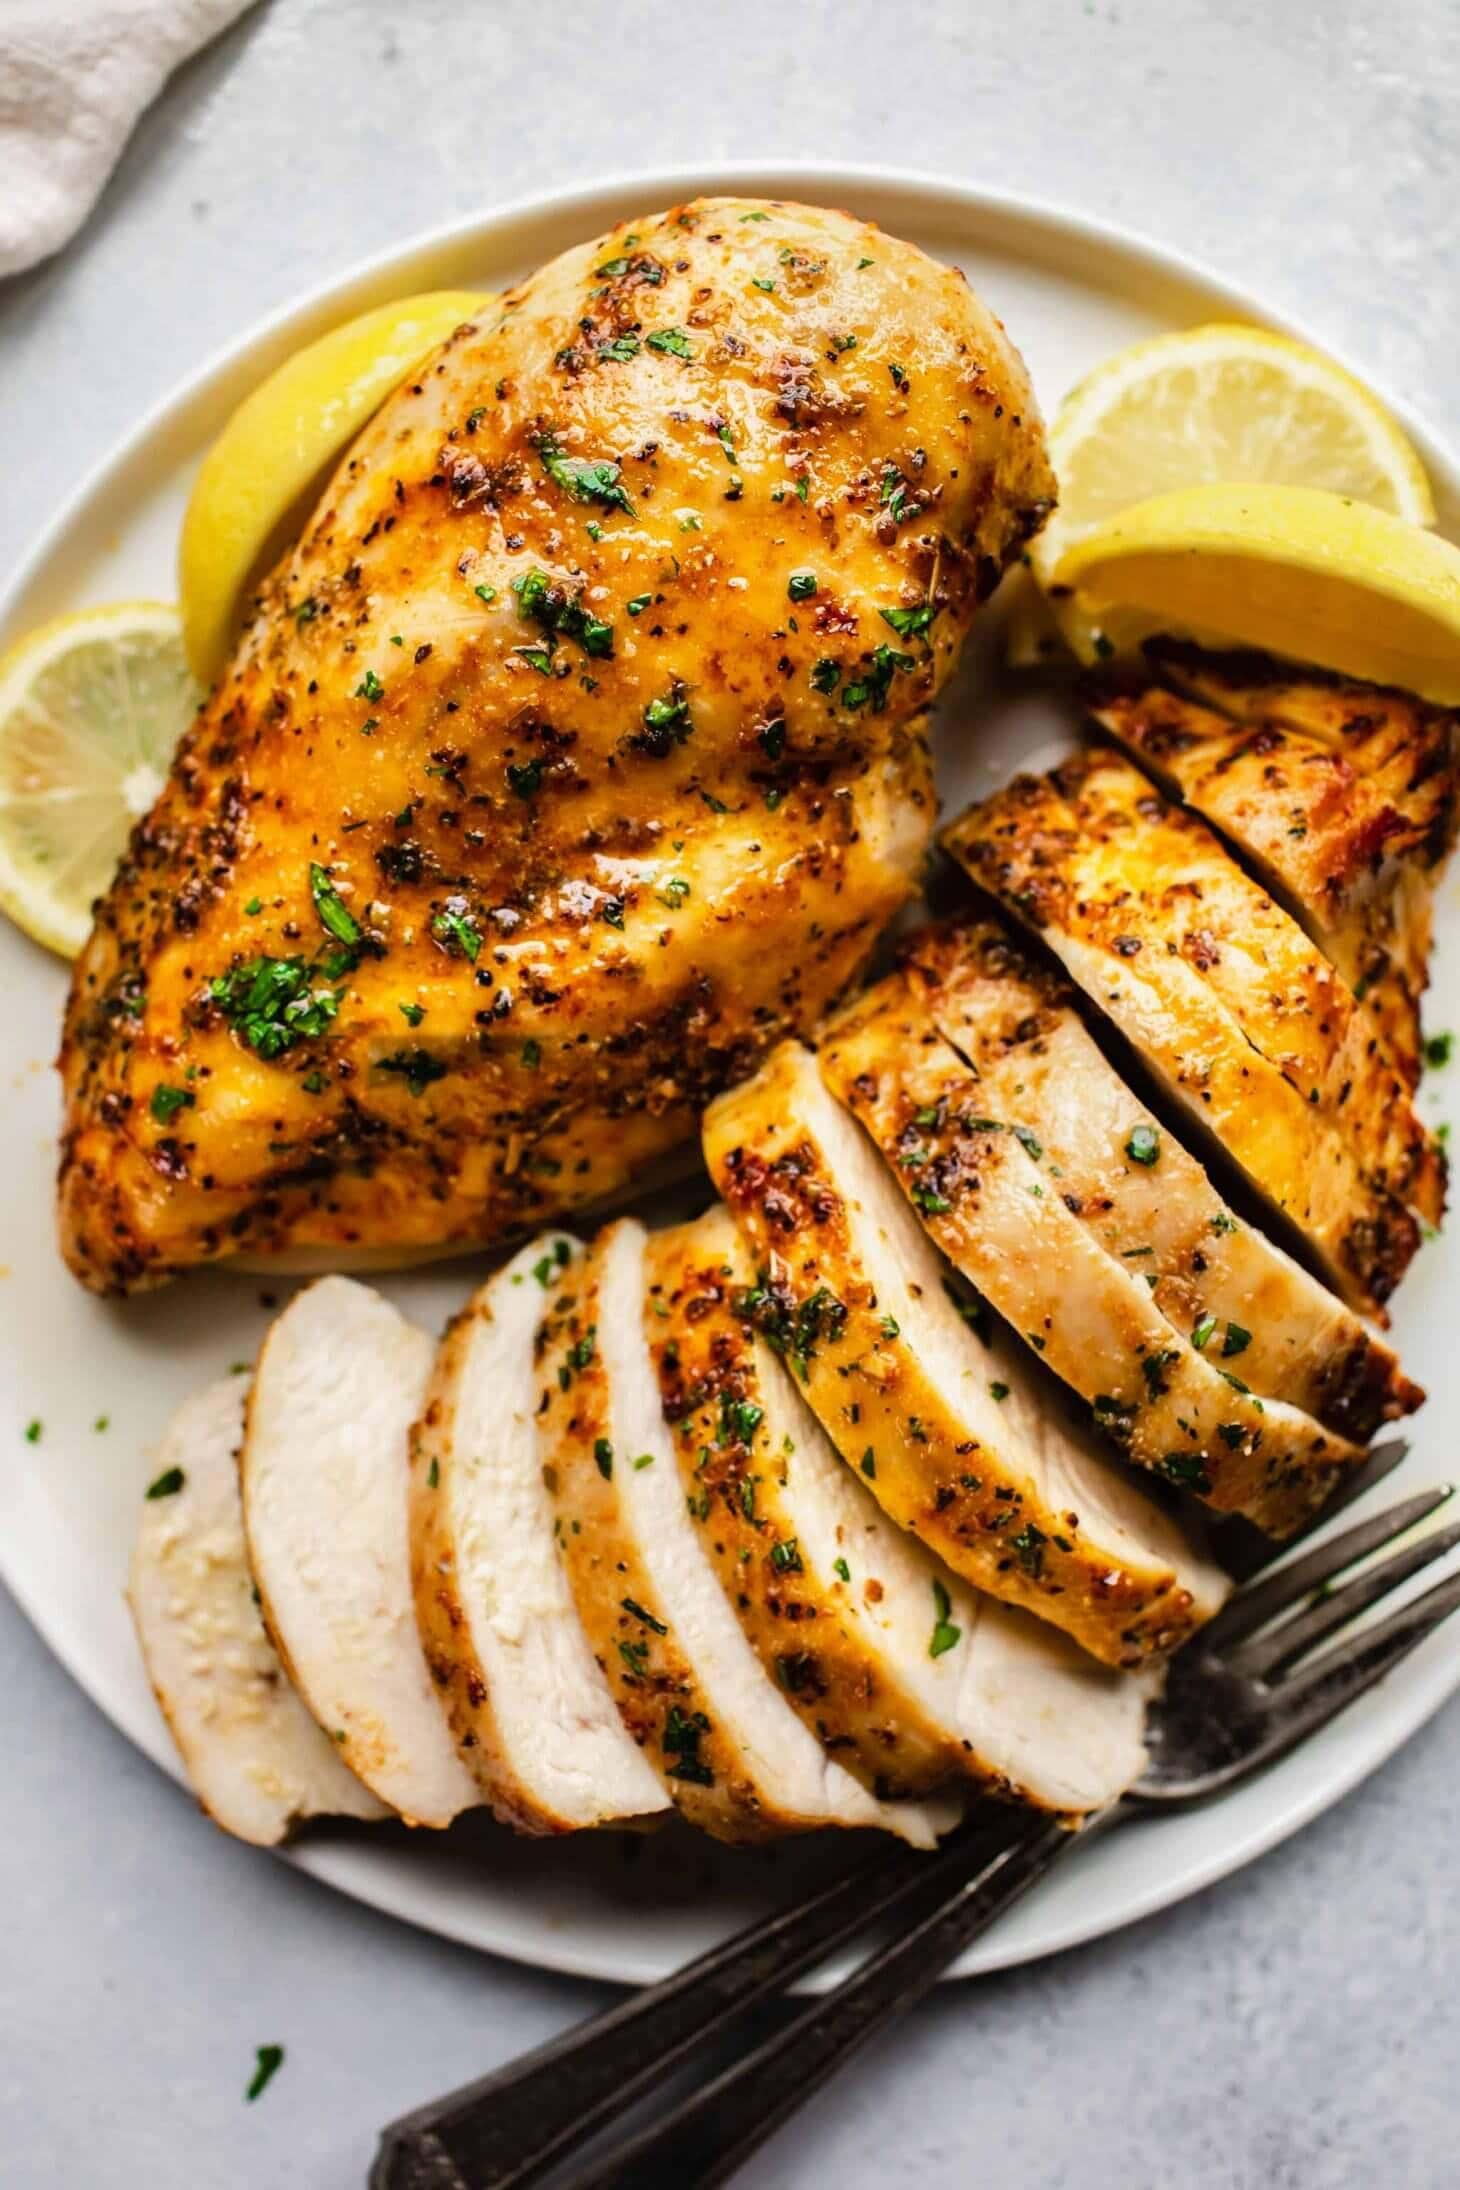 Sliced chicken breast on white plate.